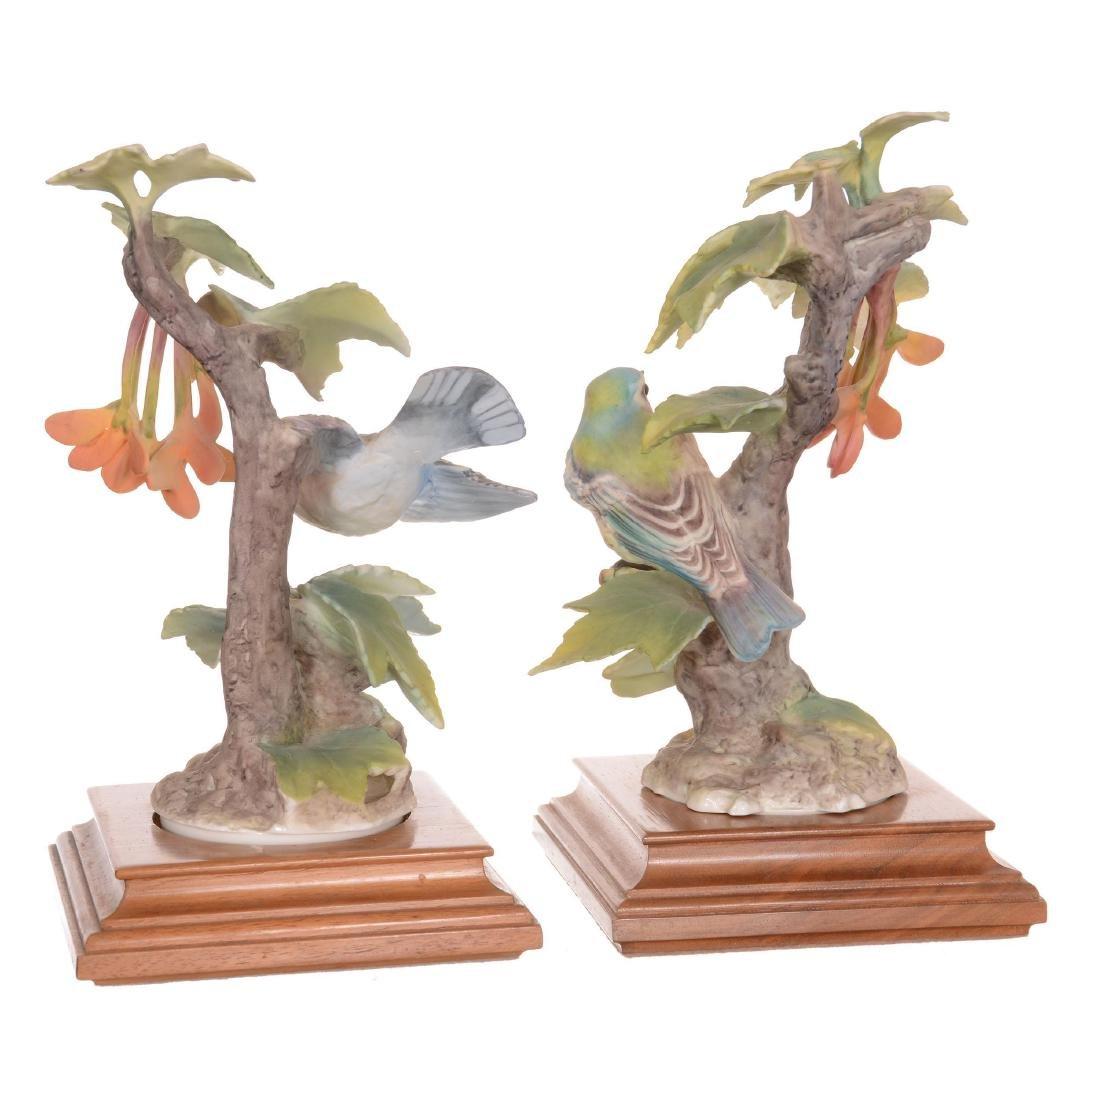 Pair of Royal Worcester Bird Figures - 2